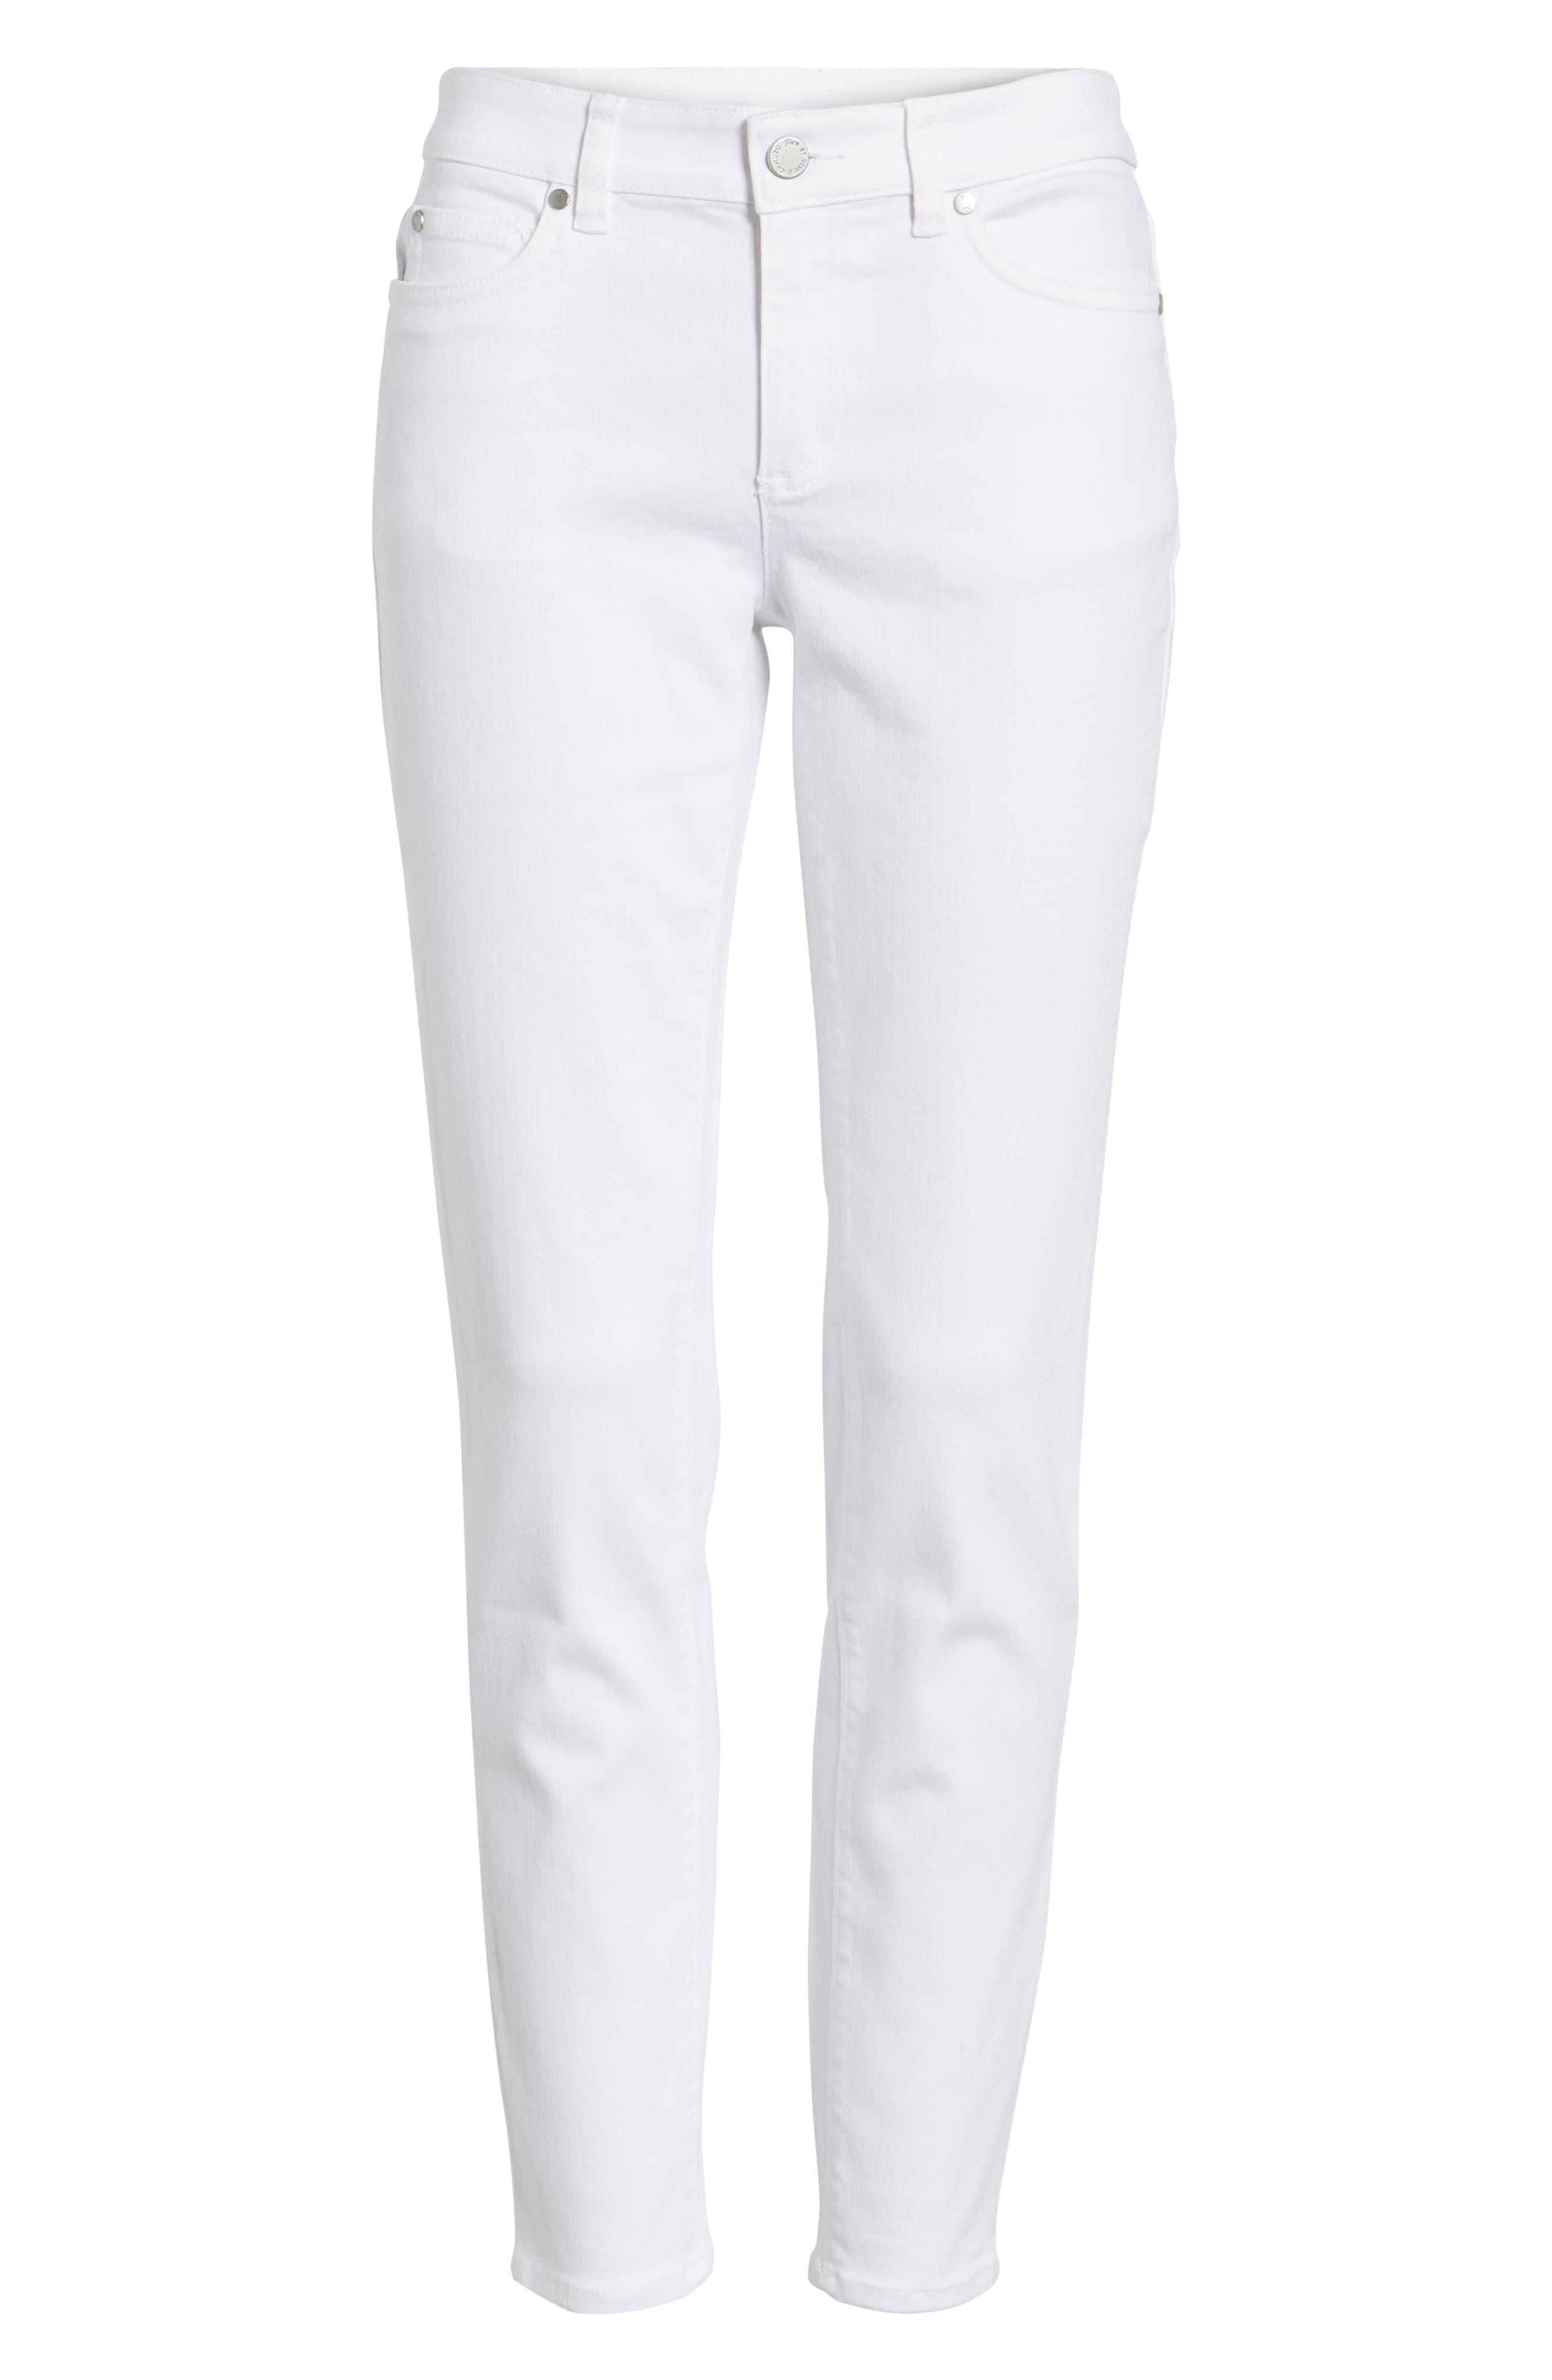 Skinny Jeans,                             Alternate thumbnail 3, color,                             ULTRA WHITE